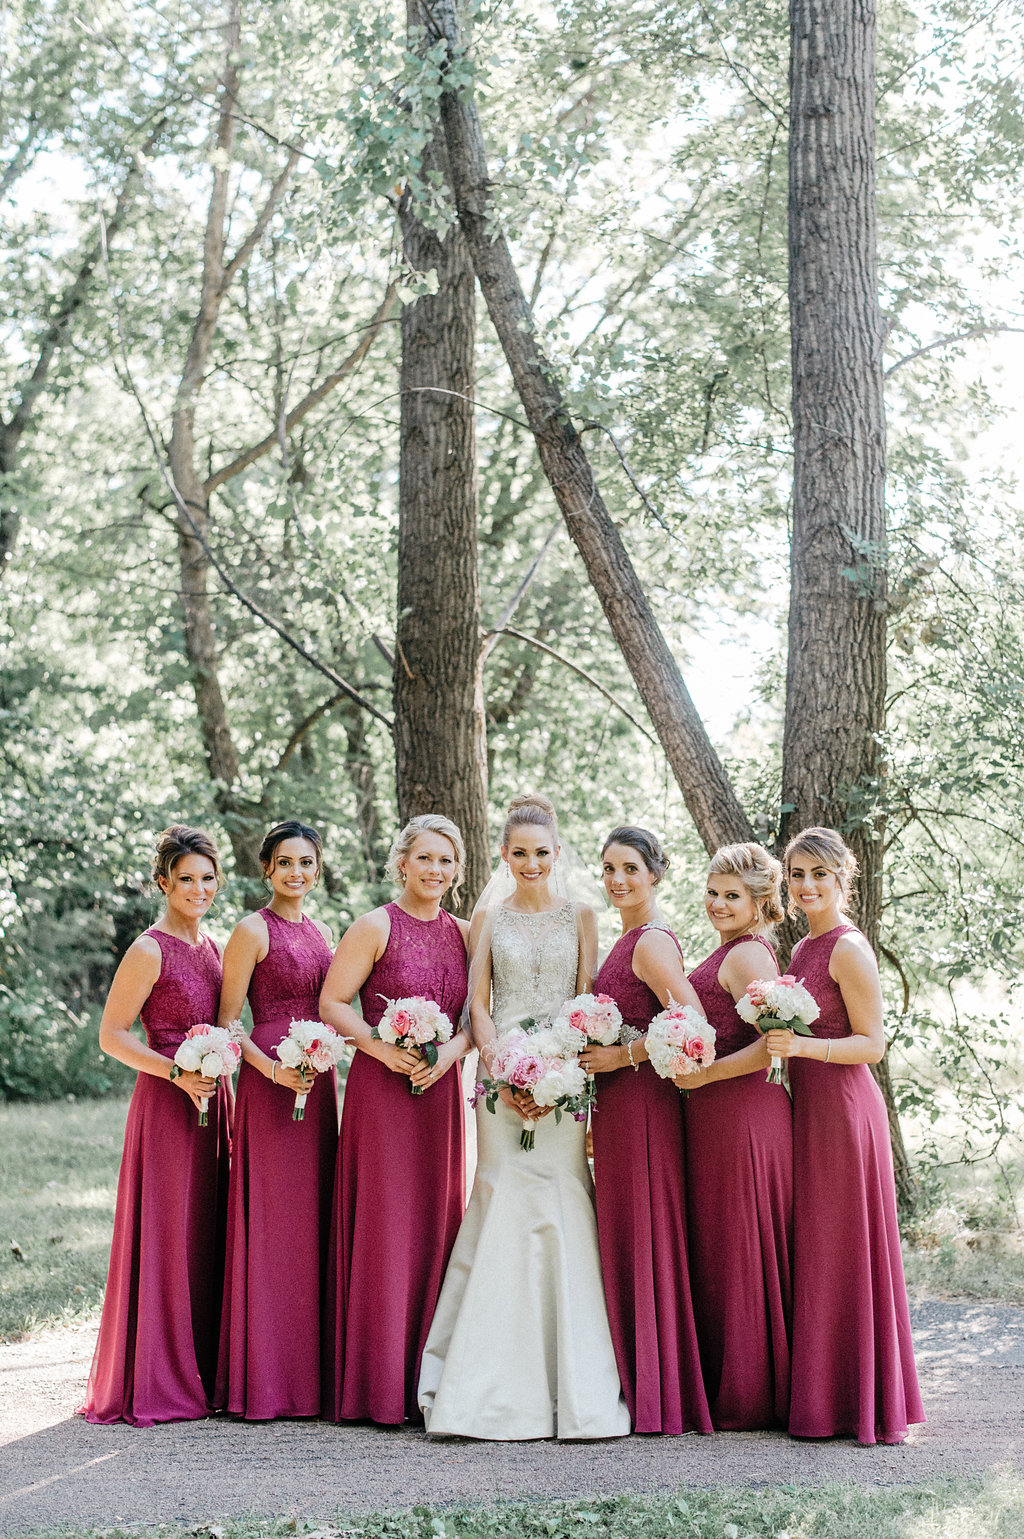 engle-olson-gene-pease-st-paul-wedding-24.jpg